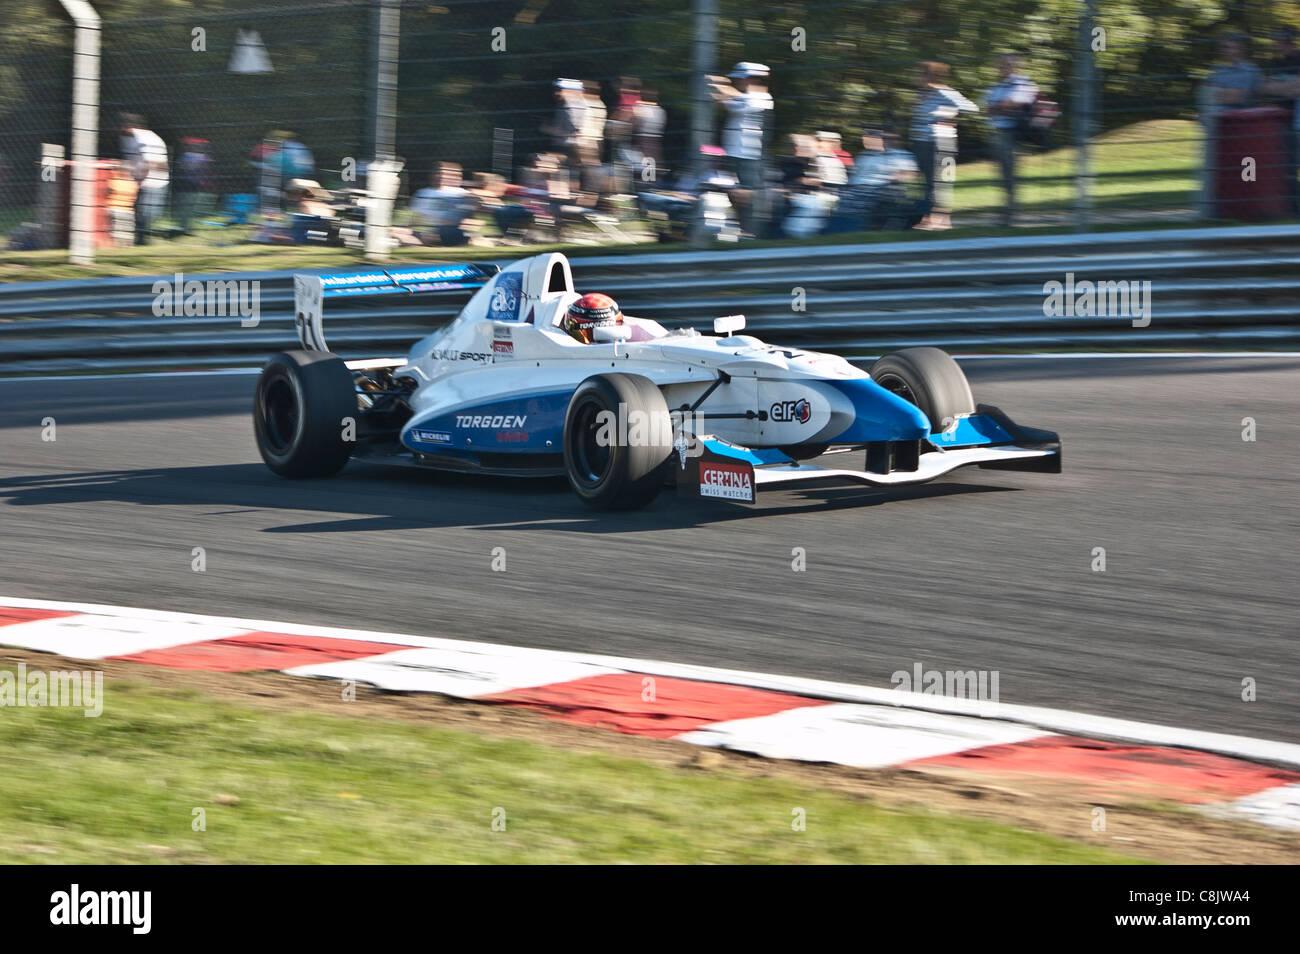 Daniel Cammish, Formula Renault Championship, Brands Hatch Motor Racing Circuit - Stock Image